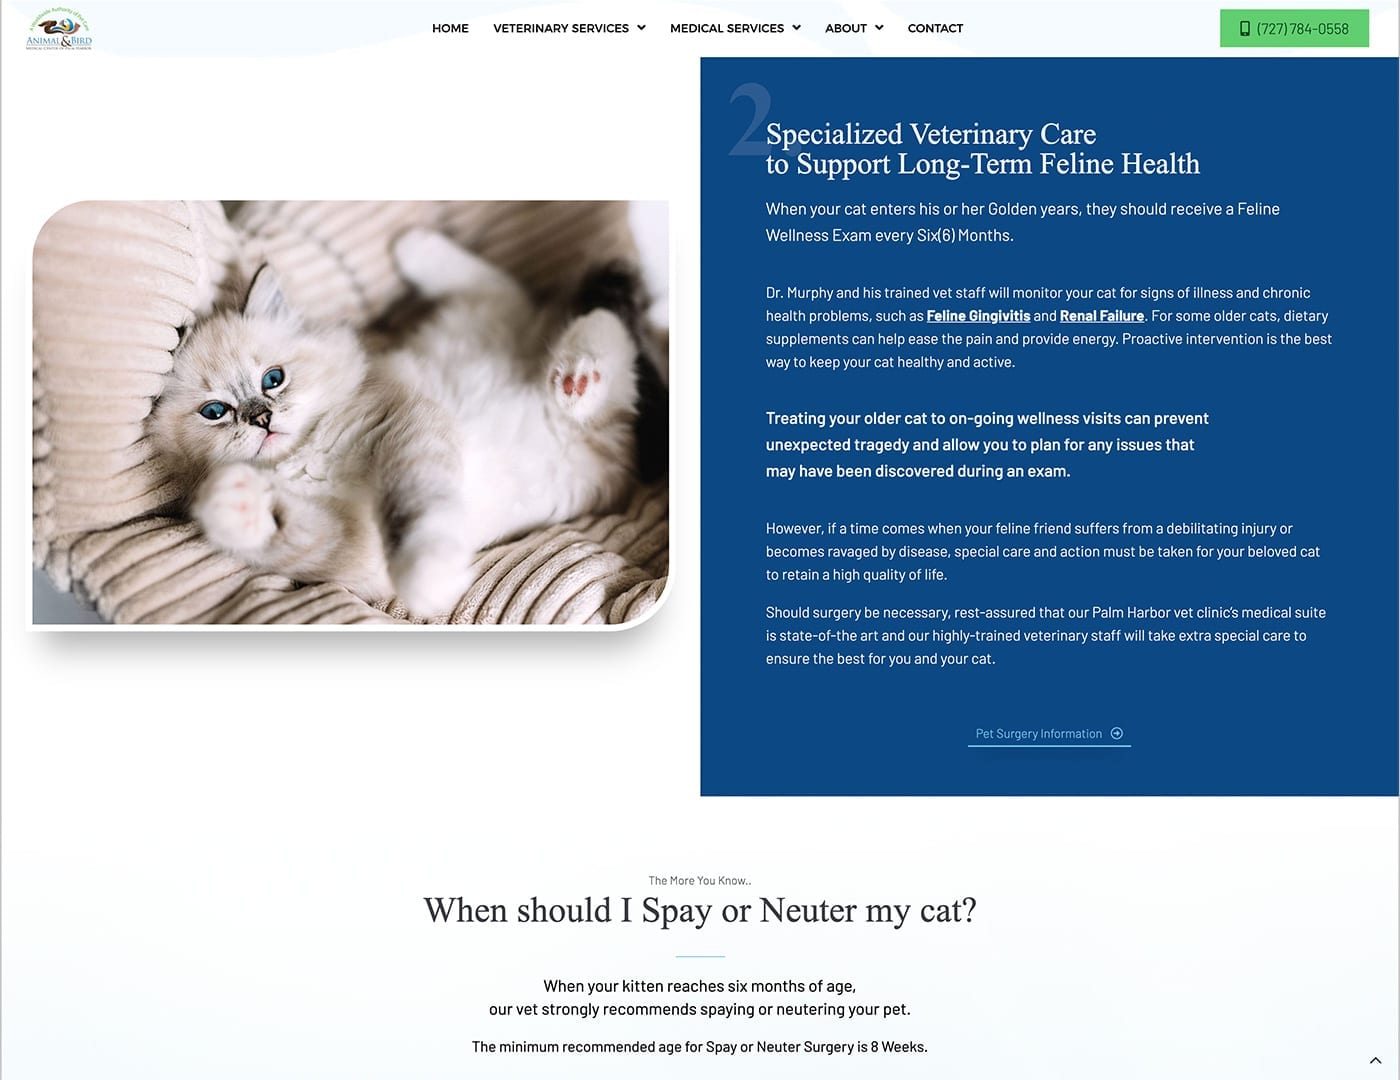 Animal Specialty Page - dogcatbirdvet.org - sliStudios Website Design | Miami